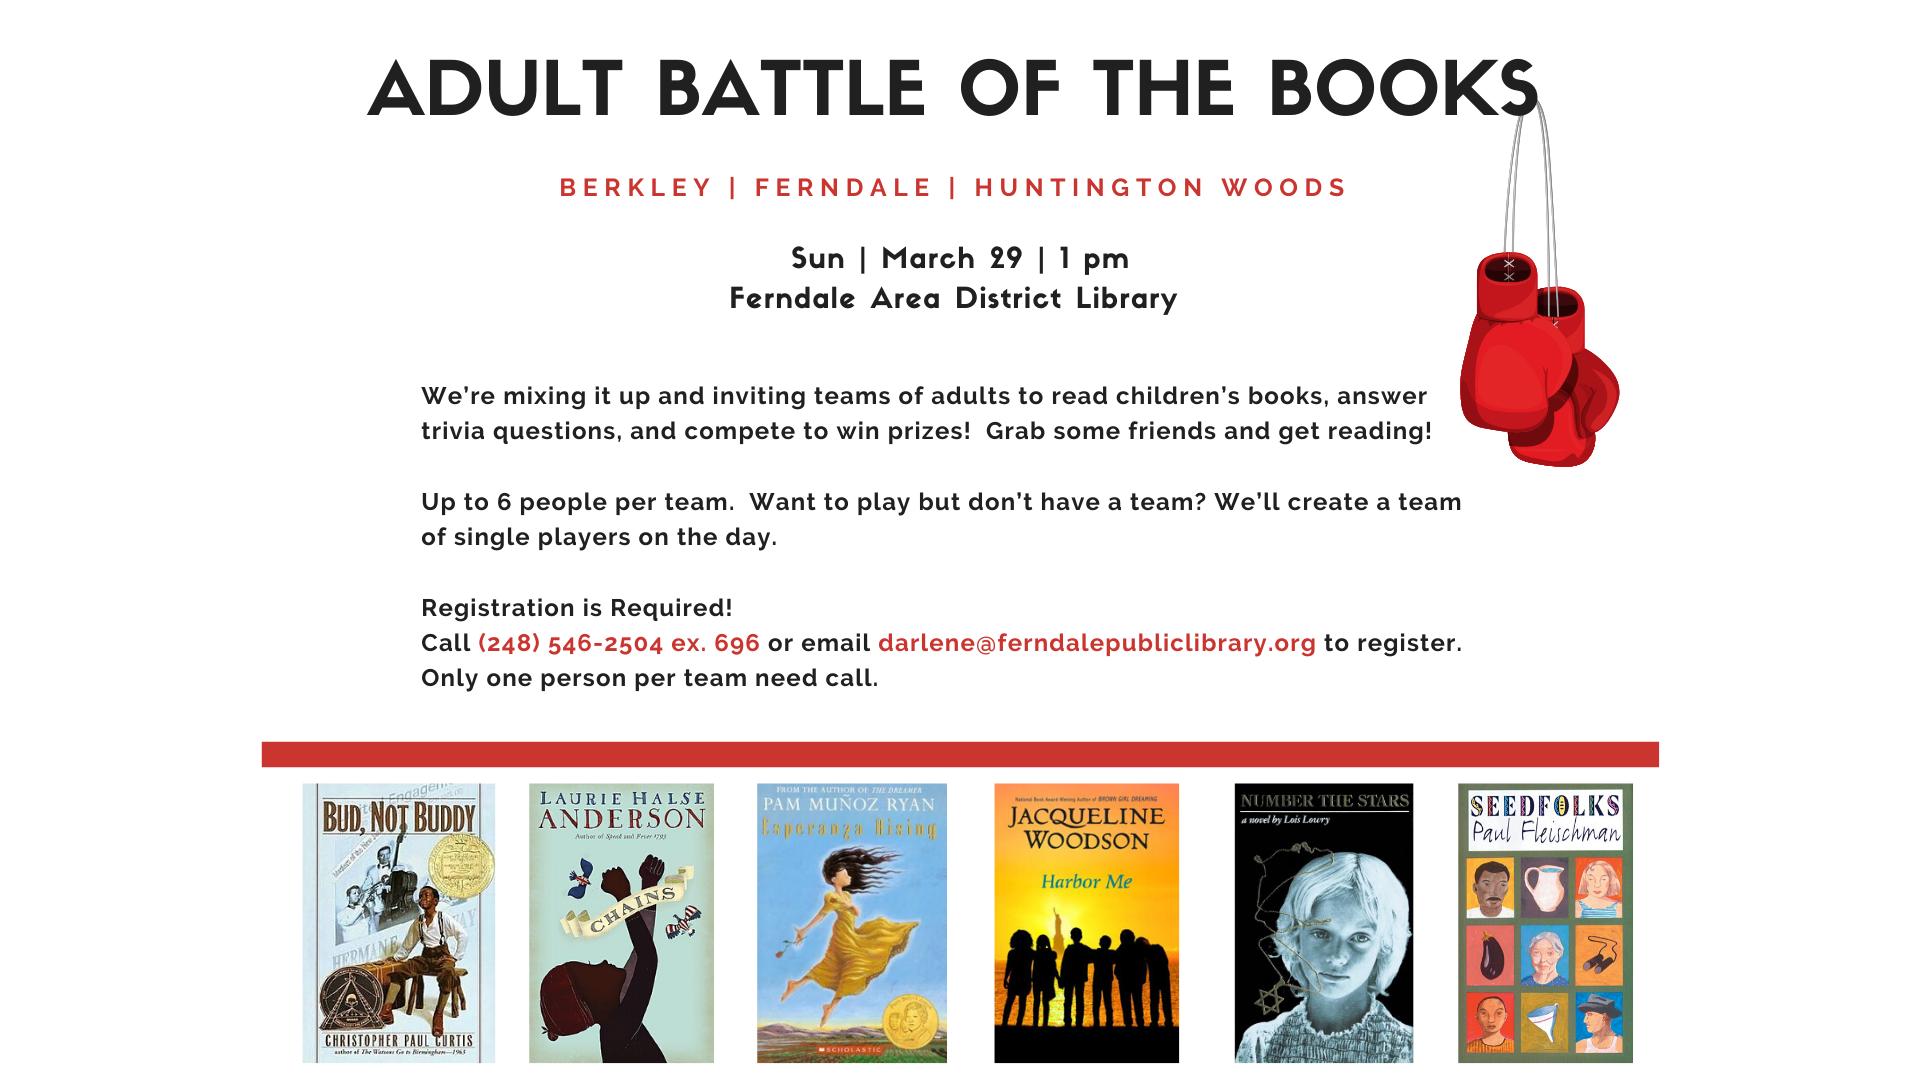 POSTPONED- Adult Battle of the Books